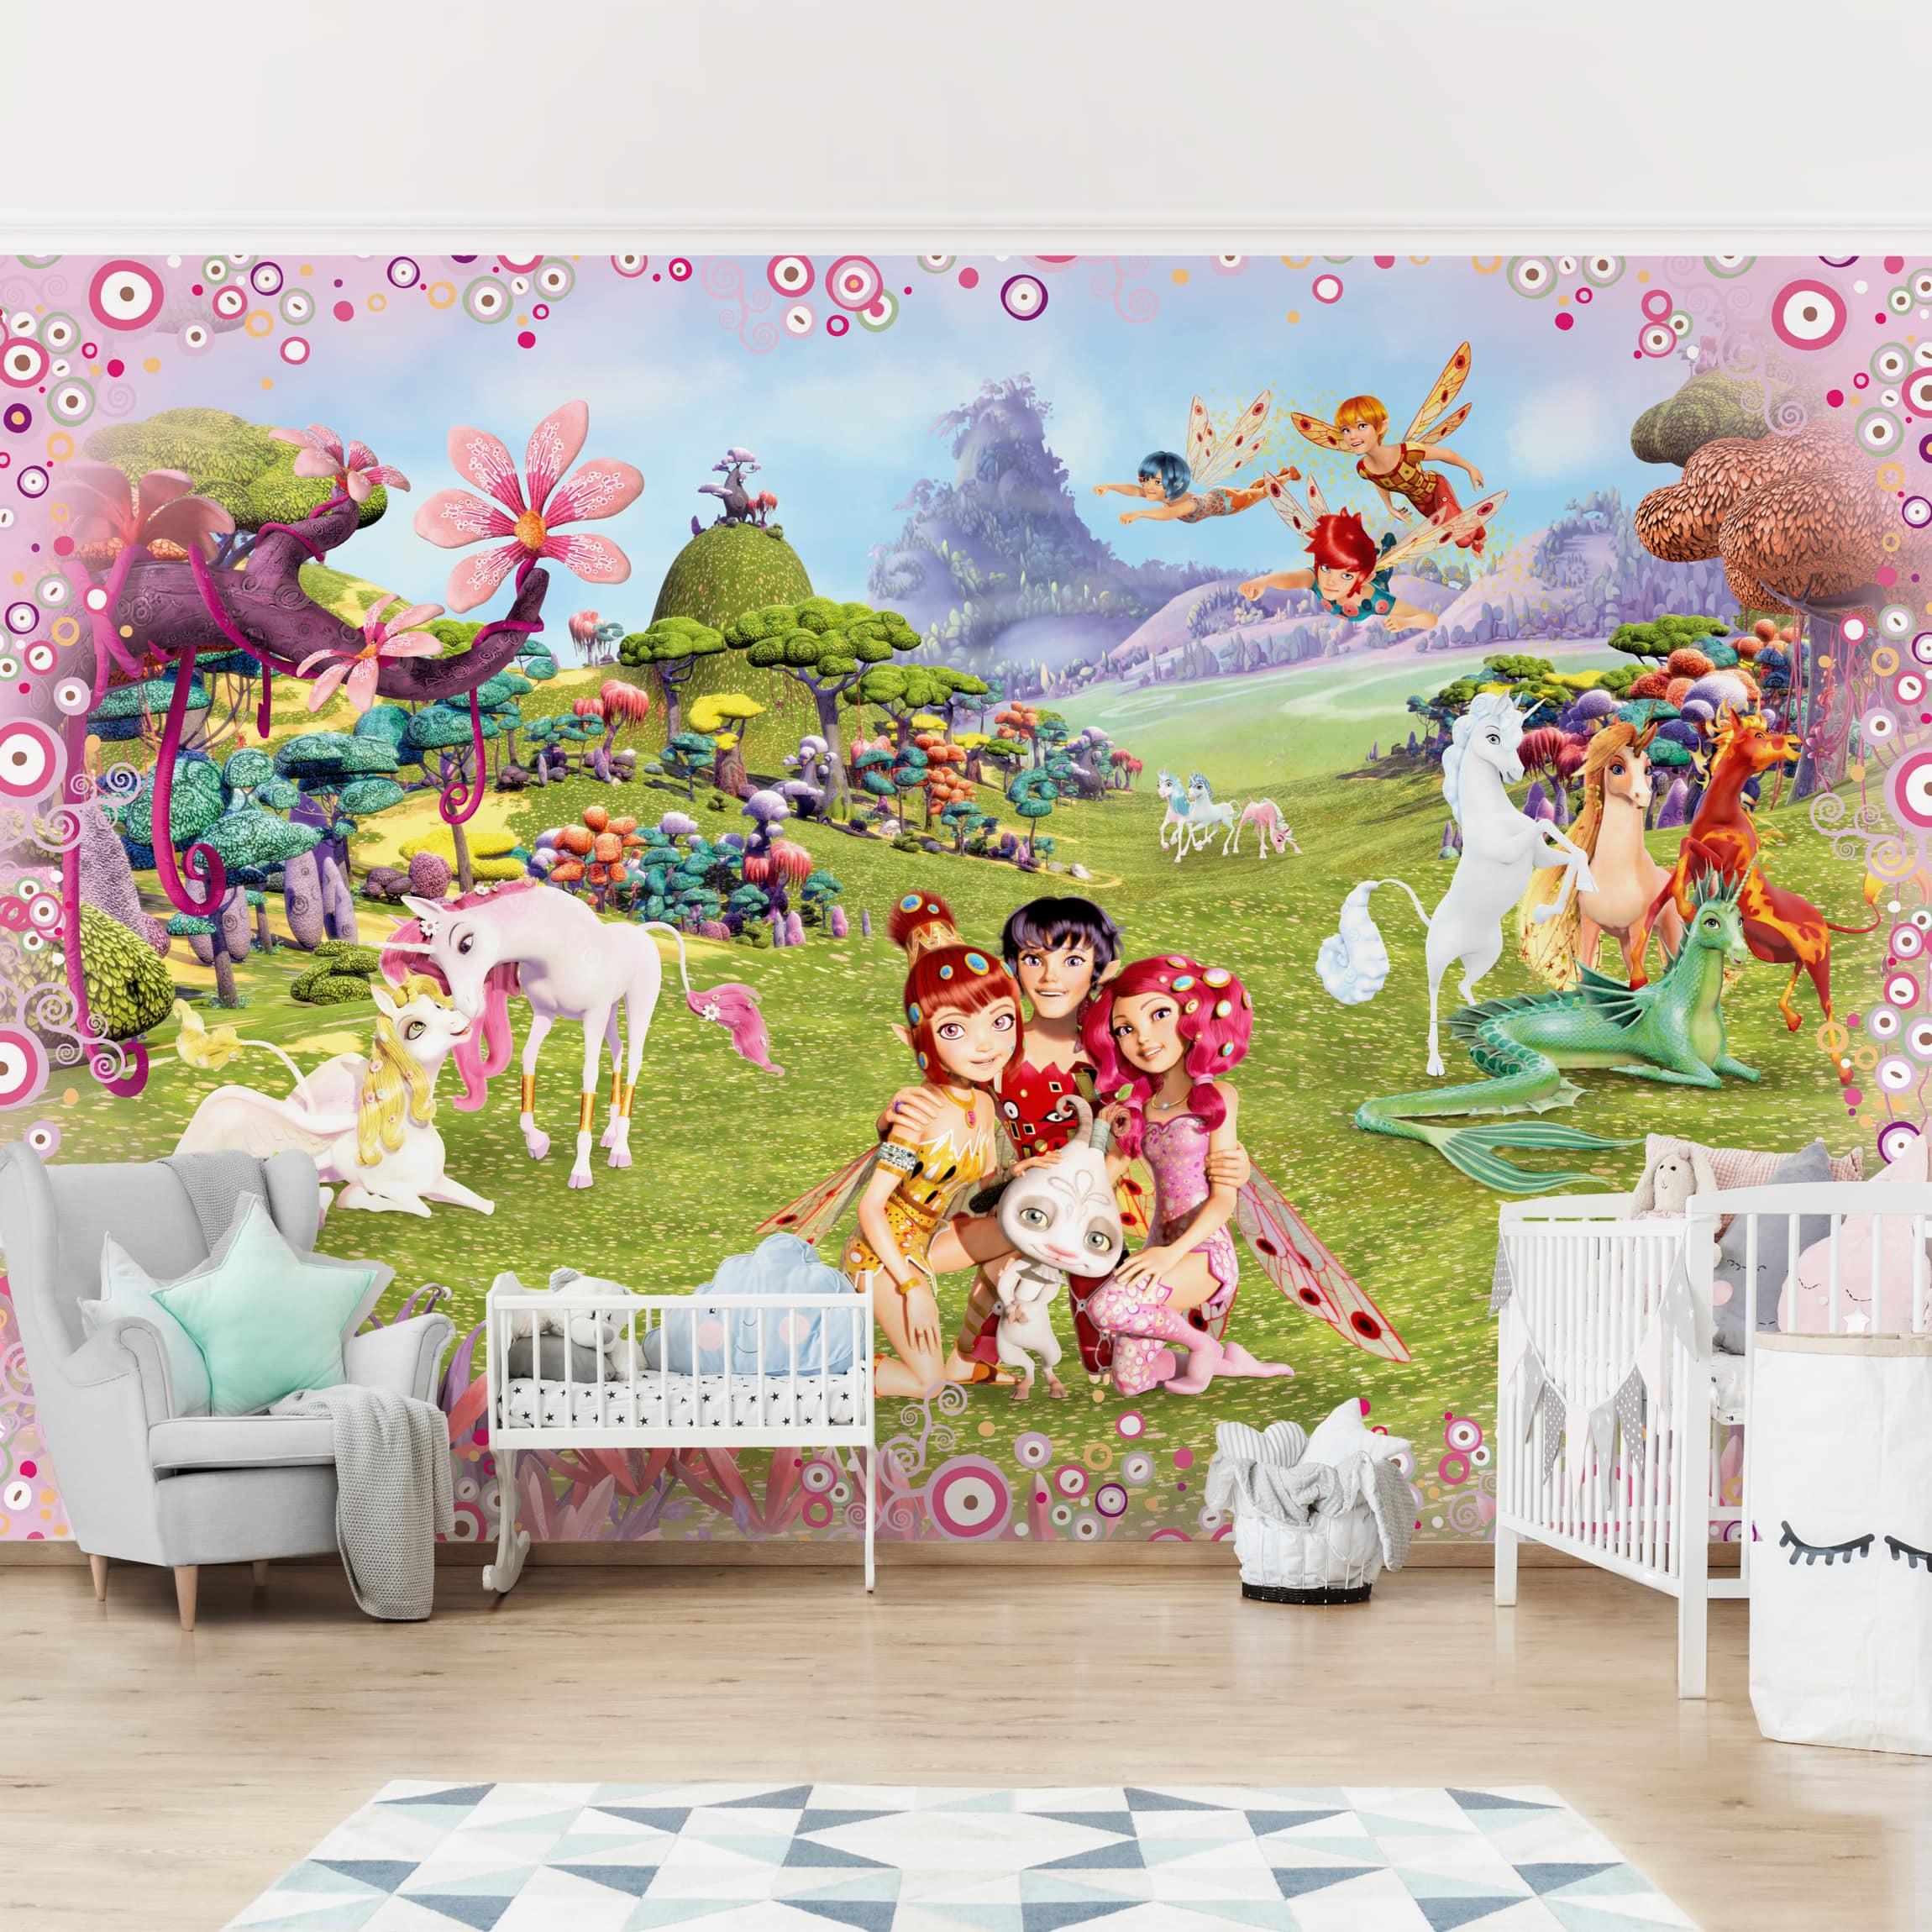 Selbstklebende Tapete Kinderzimmer - Mia and Me - Mia´s magische Welt -  Fototapete Querformat